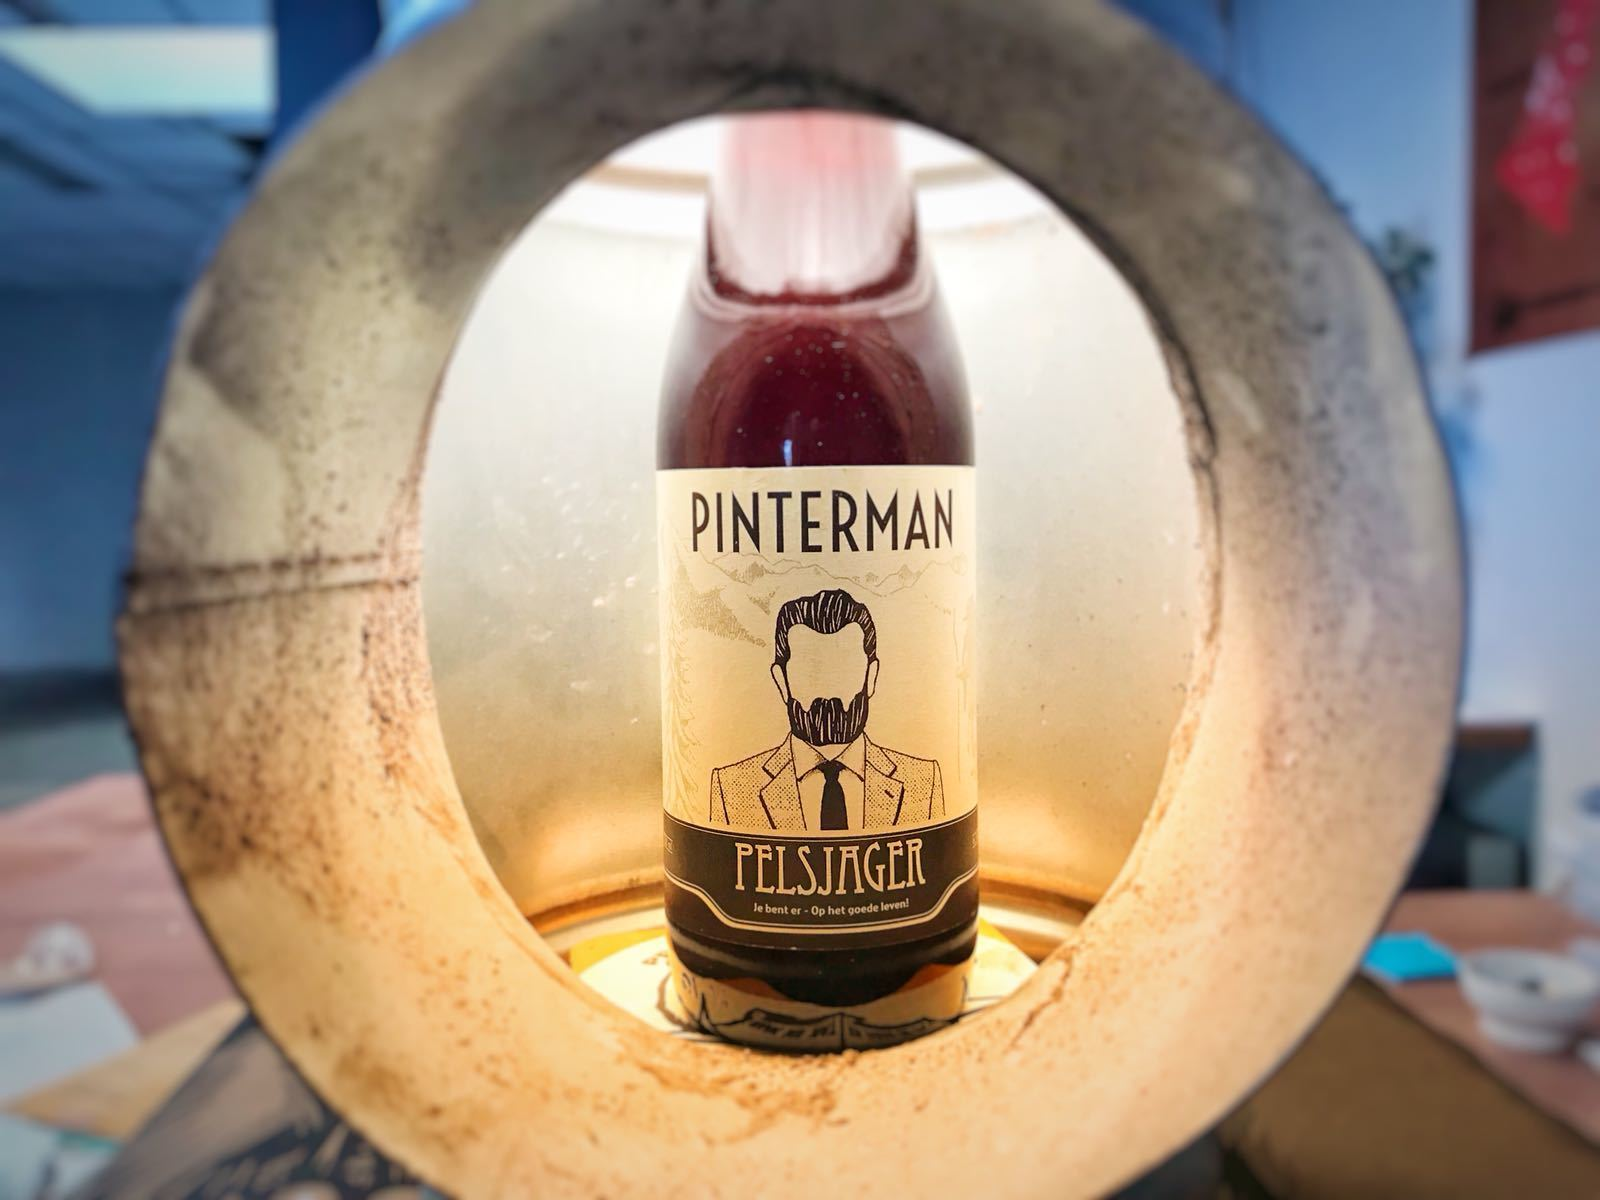 Pelsjager van Pinterman i.o.